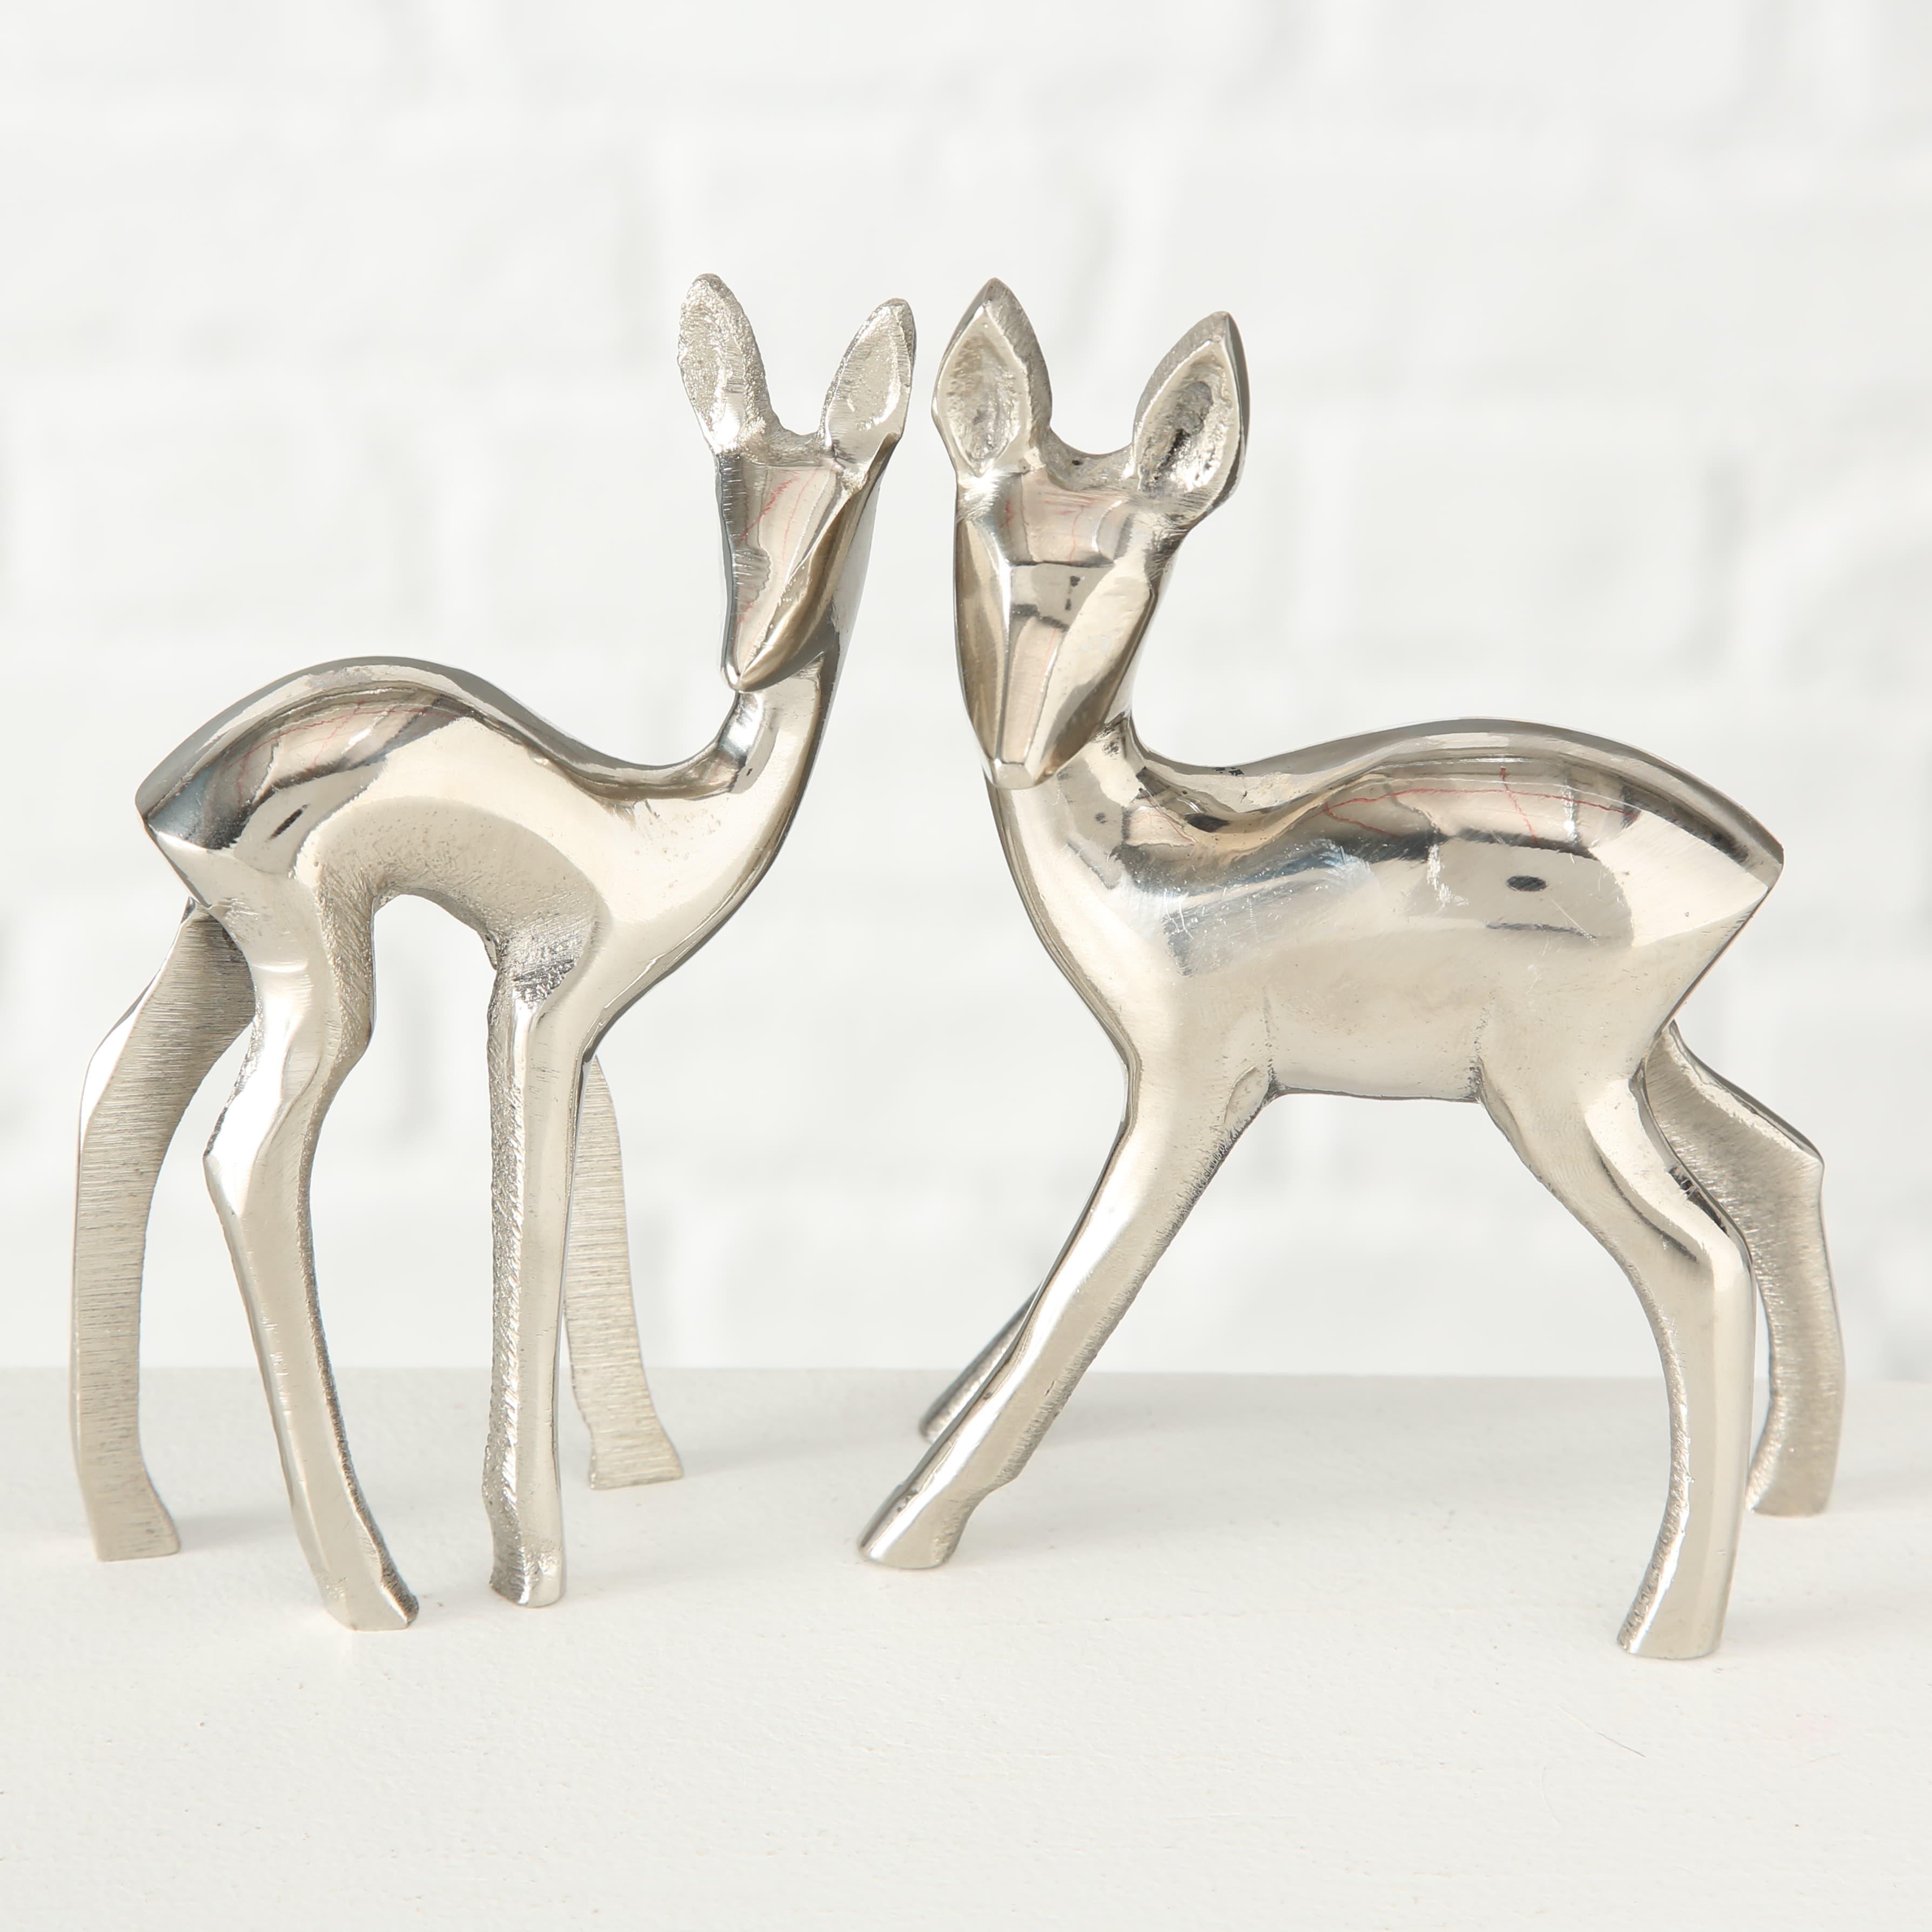 Decoratiune metalica Bambi Argintiu, Modele Asortate, l9xA13xH13 cm poza